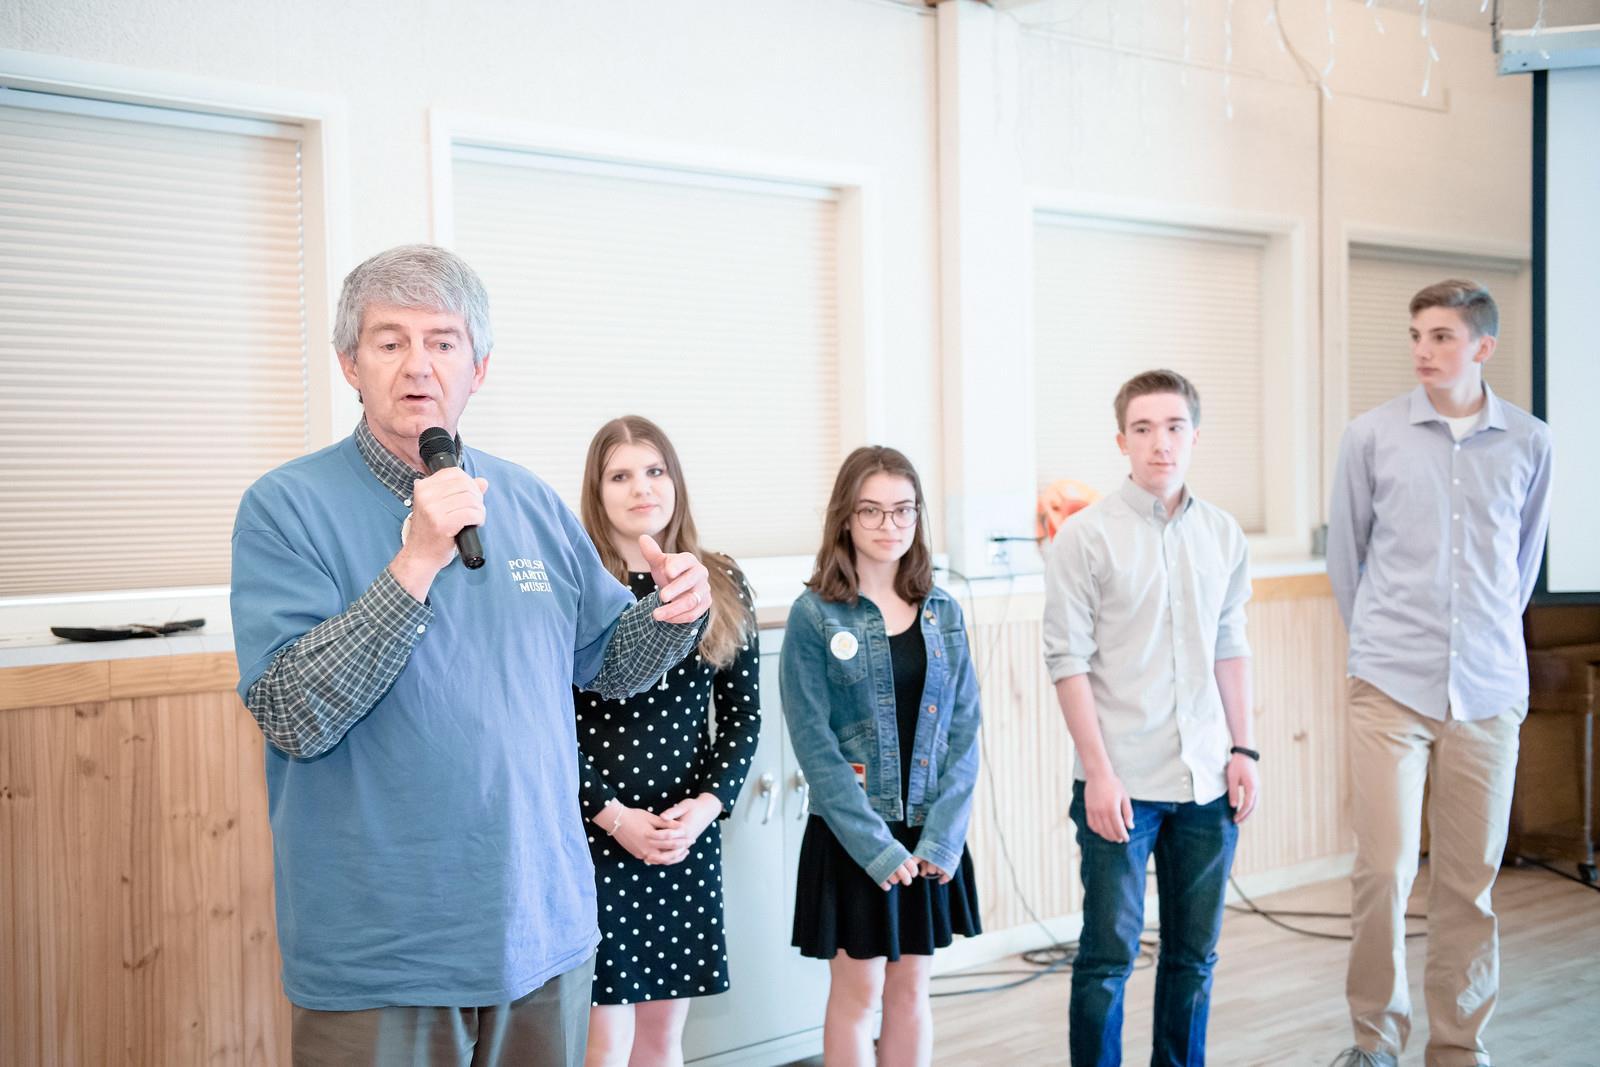 Poulsbo Rotary Scholarship Winners with Bob Hawkinson